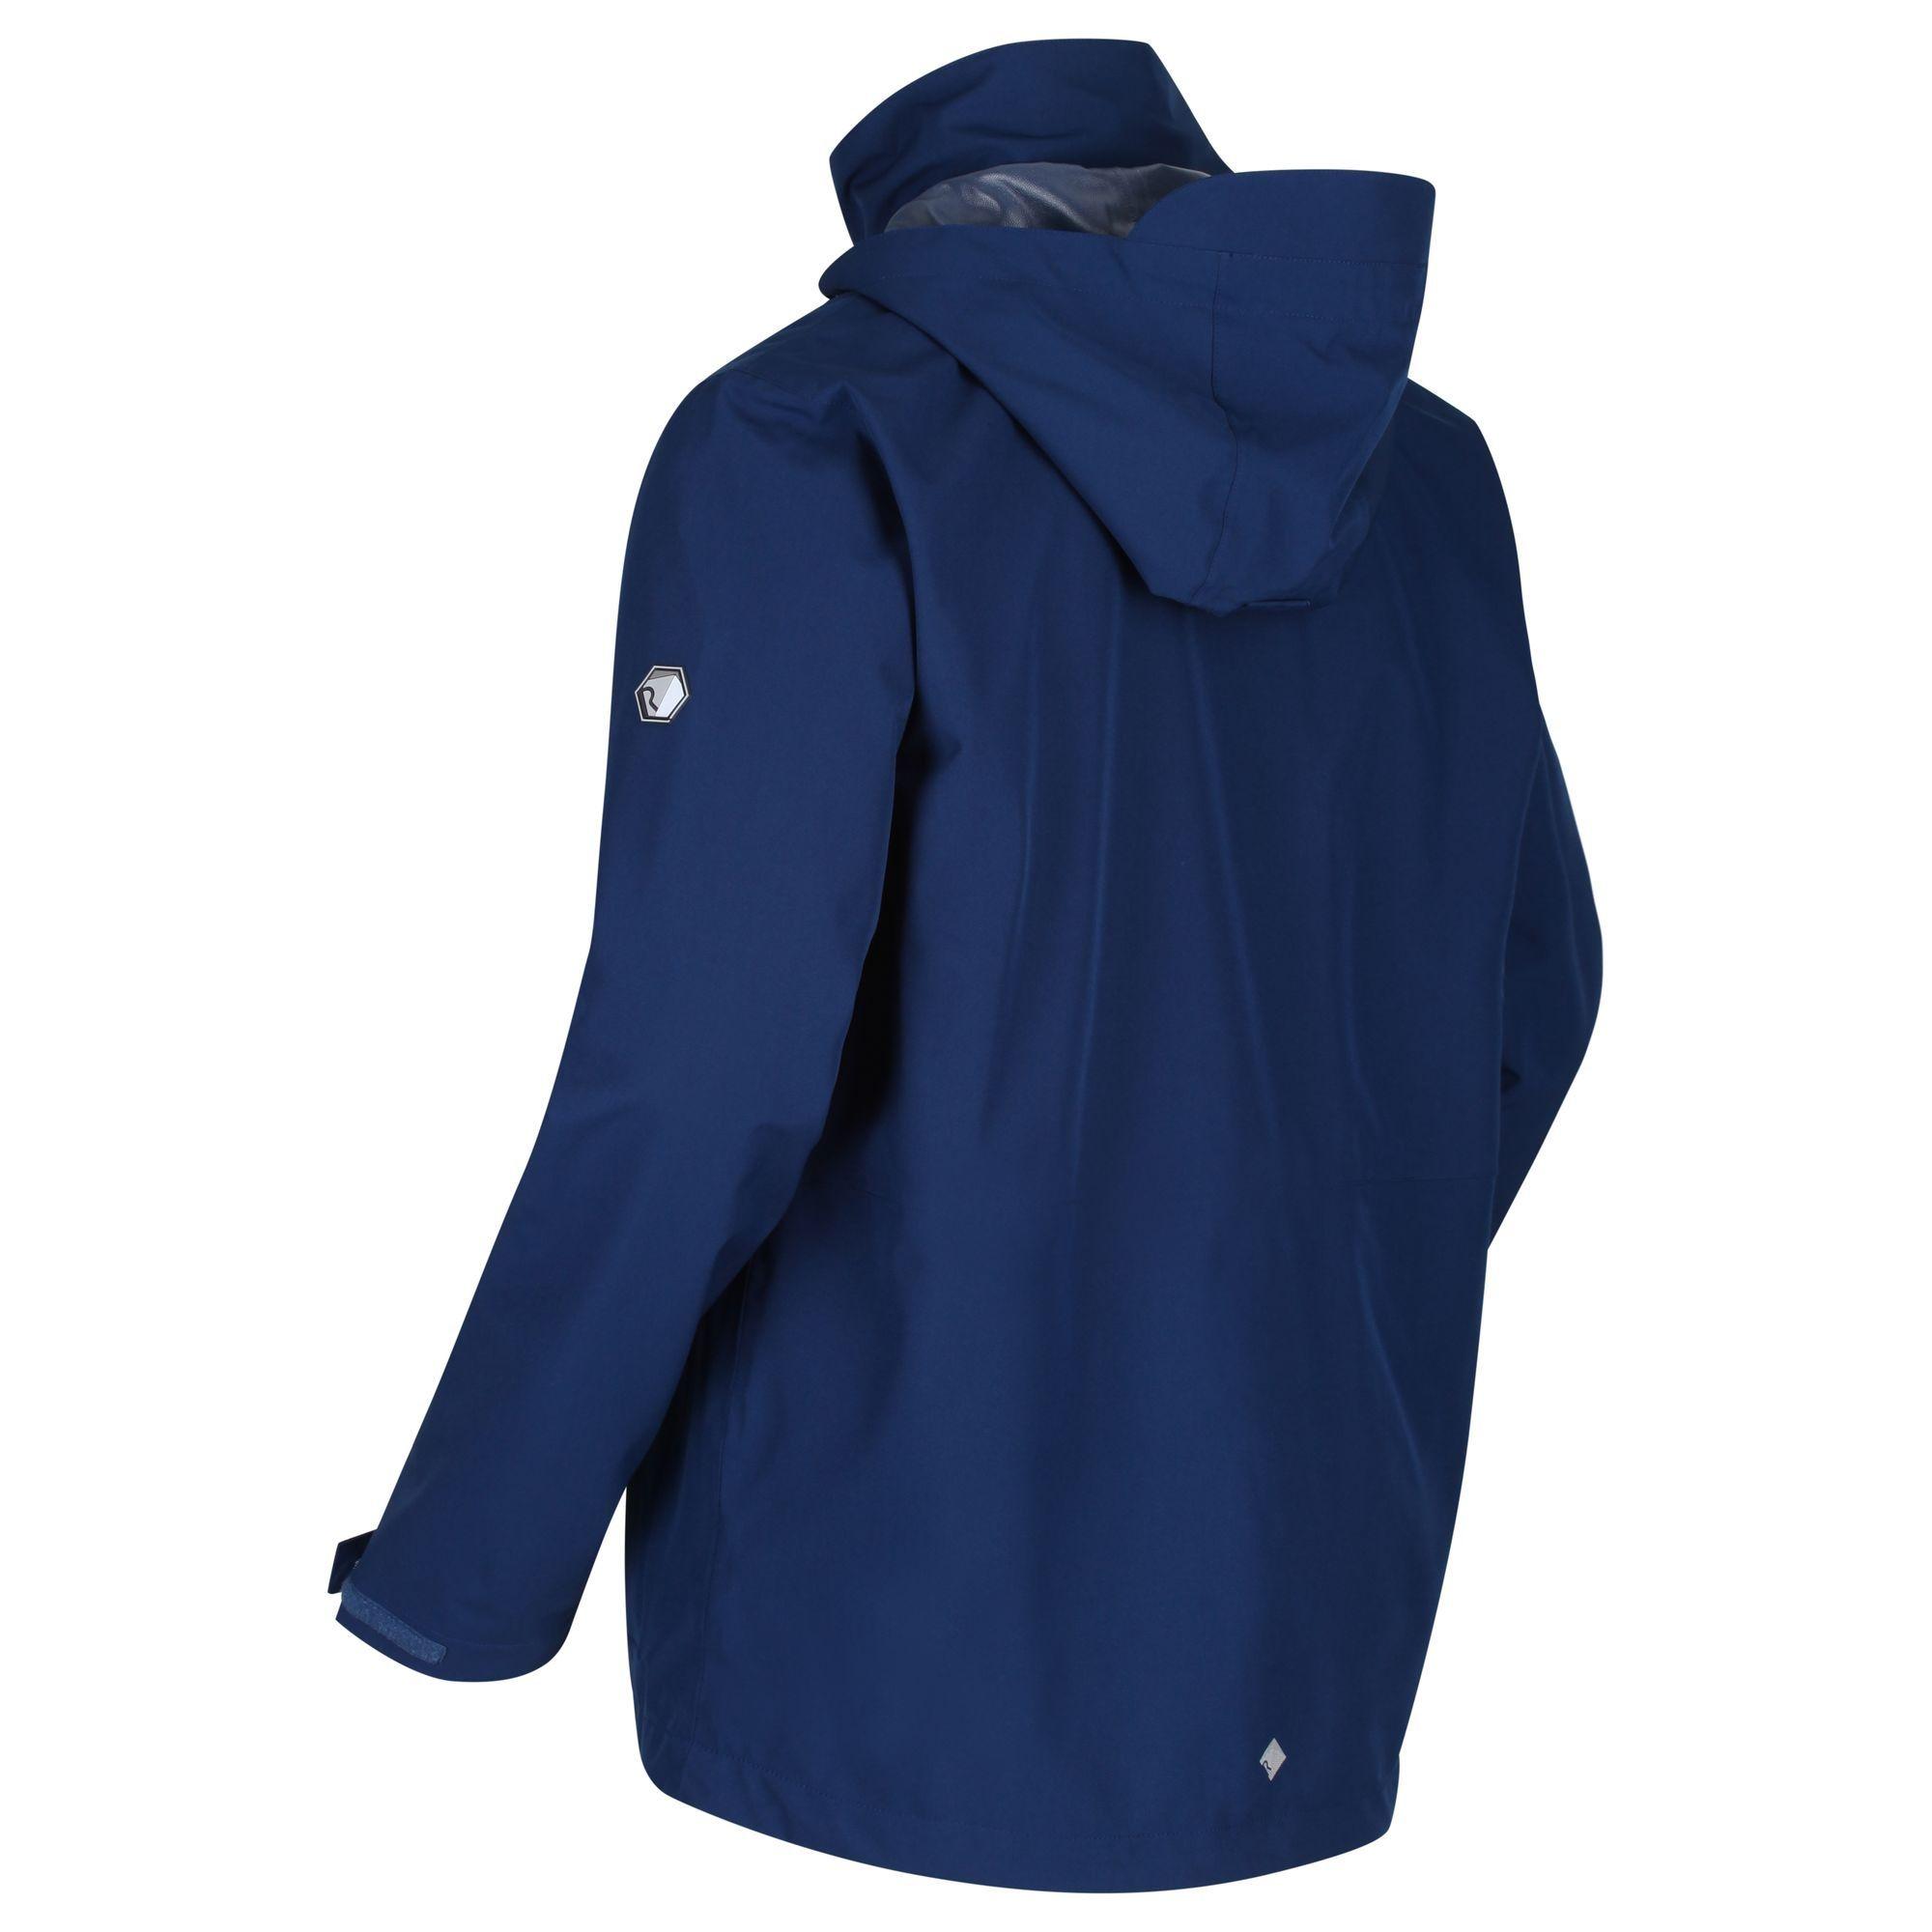 Regatta Mens Northton III 3 In 1 Jacket With Concealed Hood